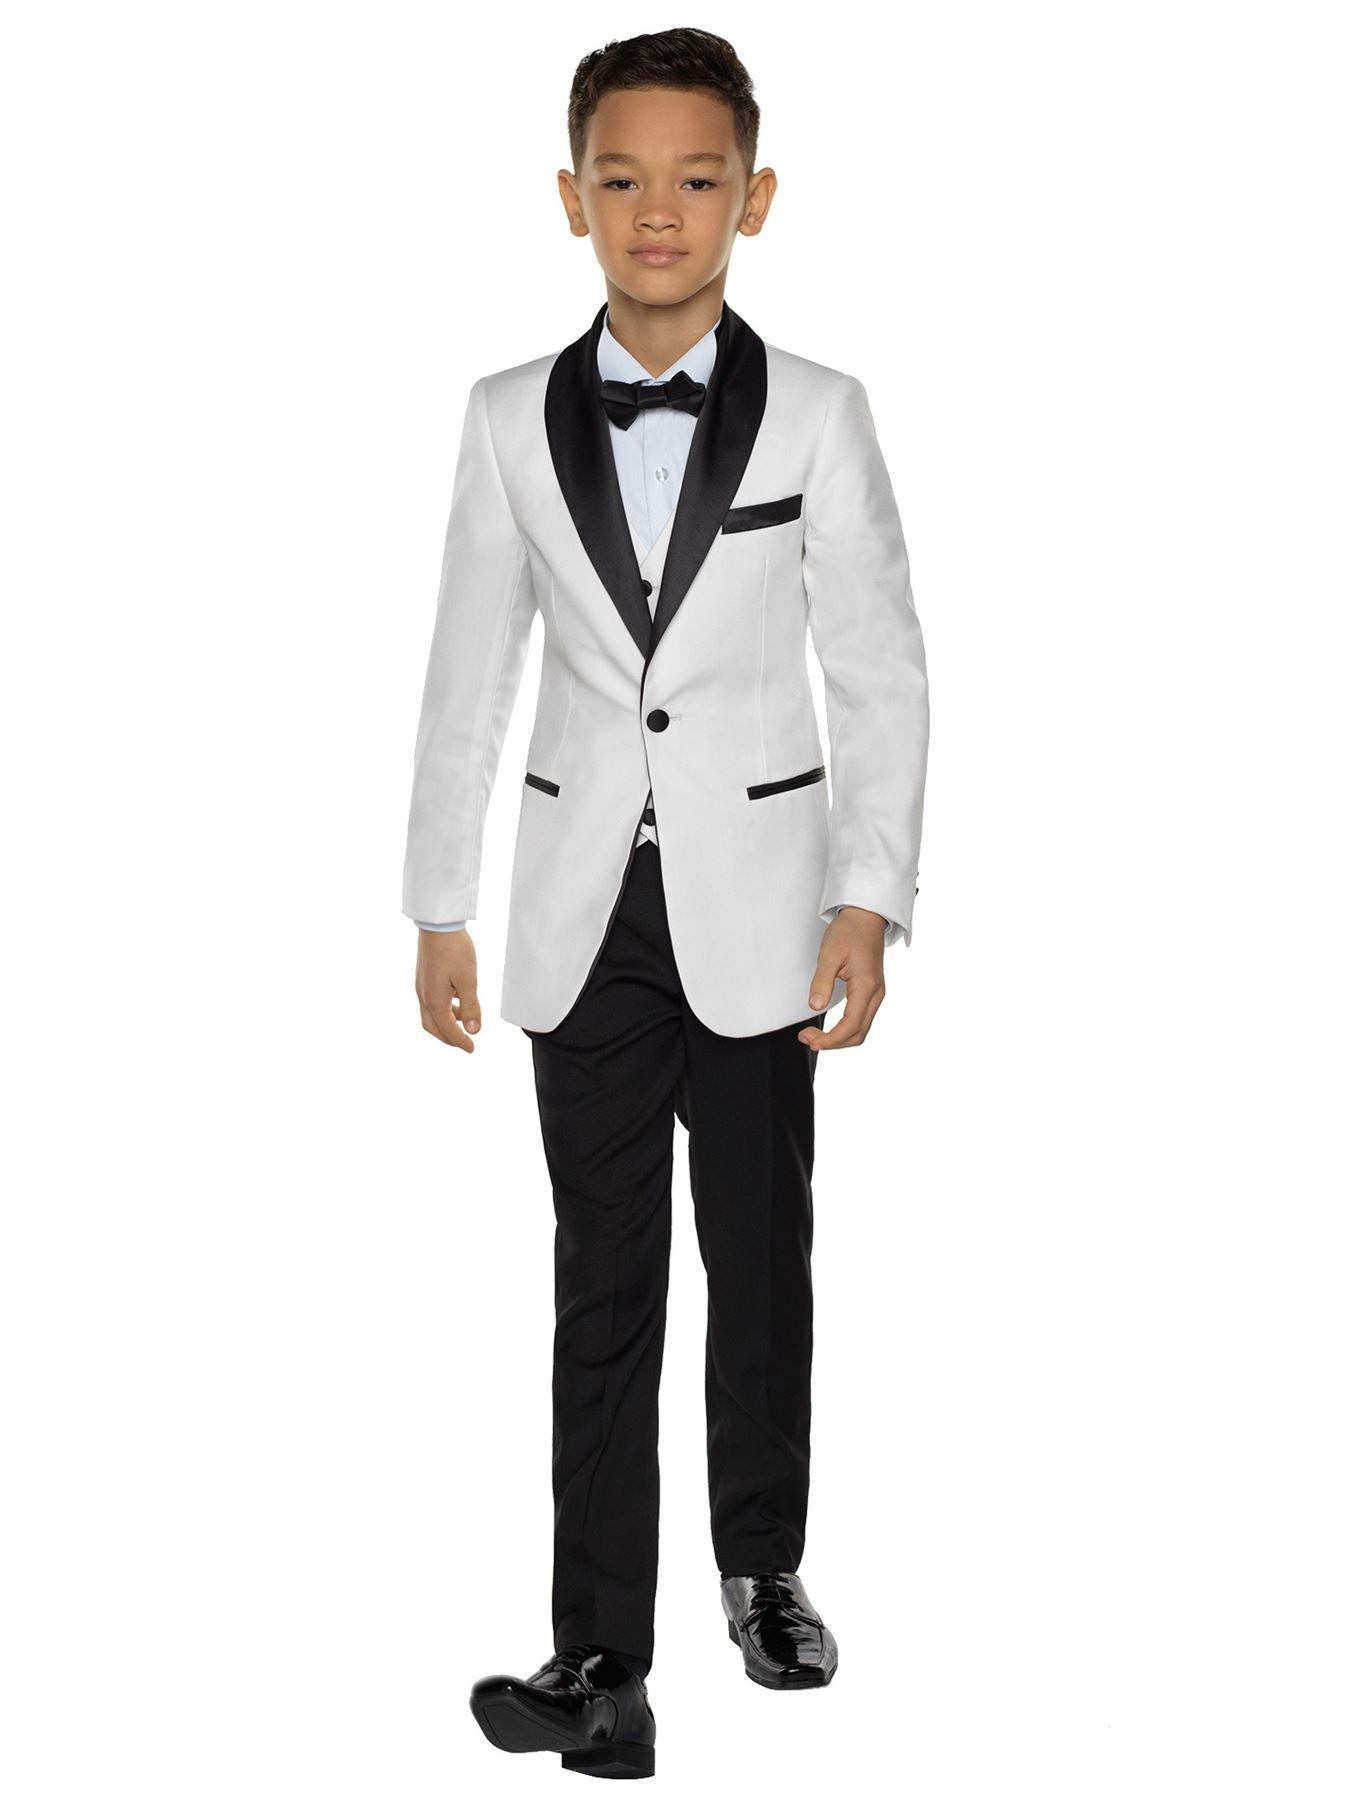 Paisley of London, Porter Ivory Slim Fit Tuxedo, Boys Formal Occasion Wear Set, 5